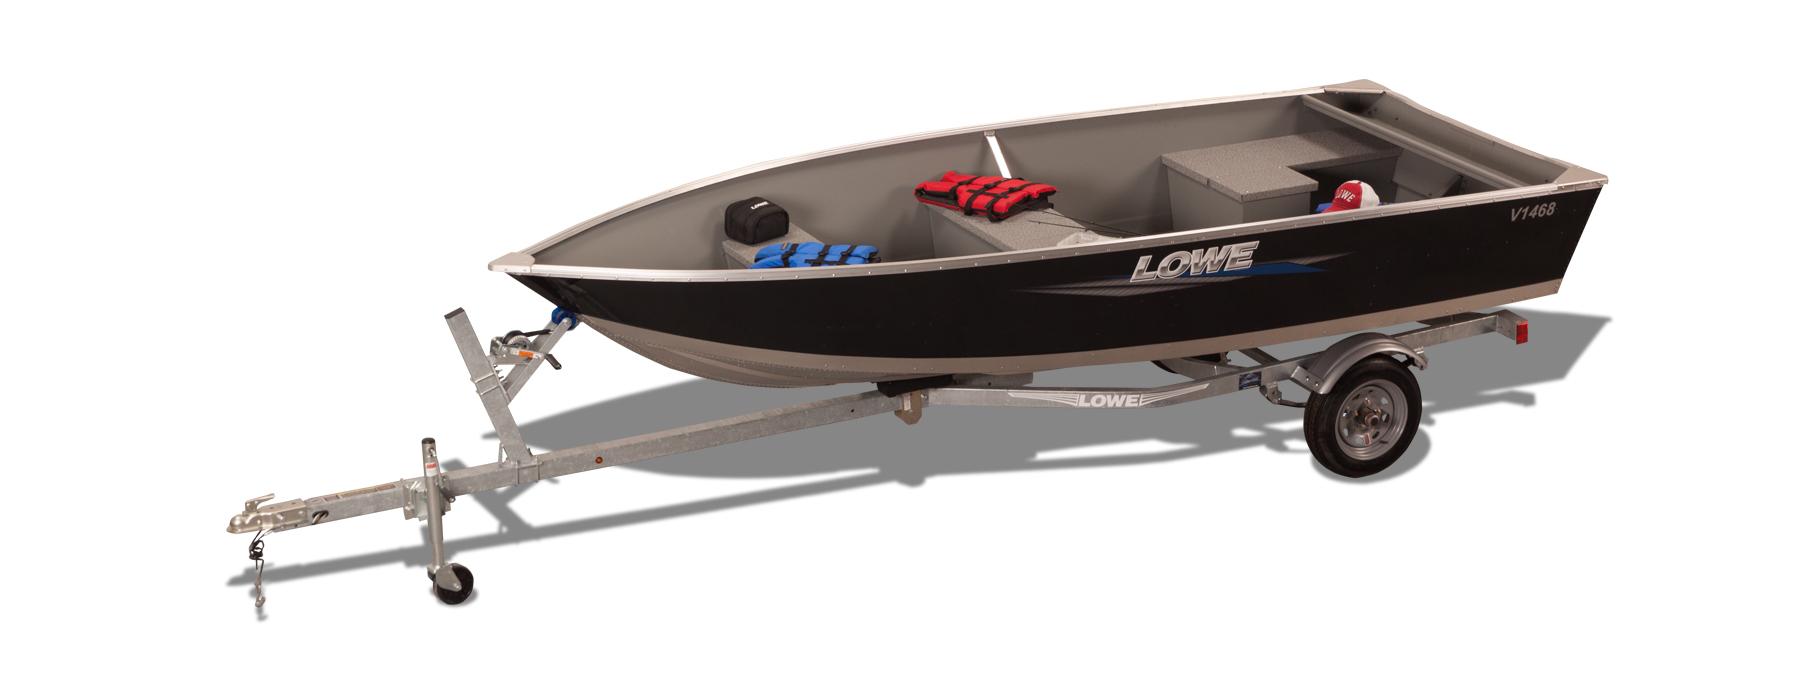 2019 Aluminum Deep V Utility V1468 Boats | Lowe Boats